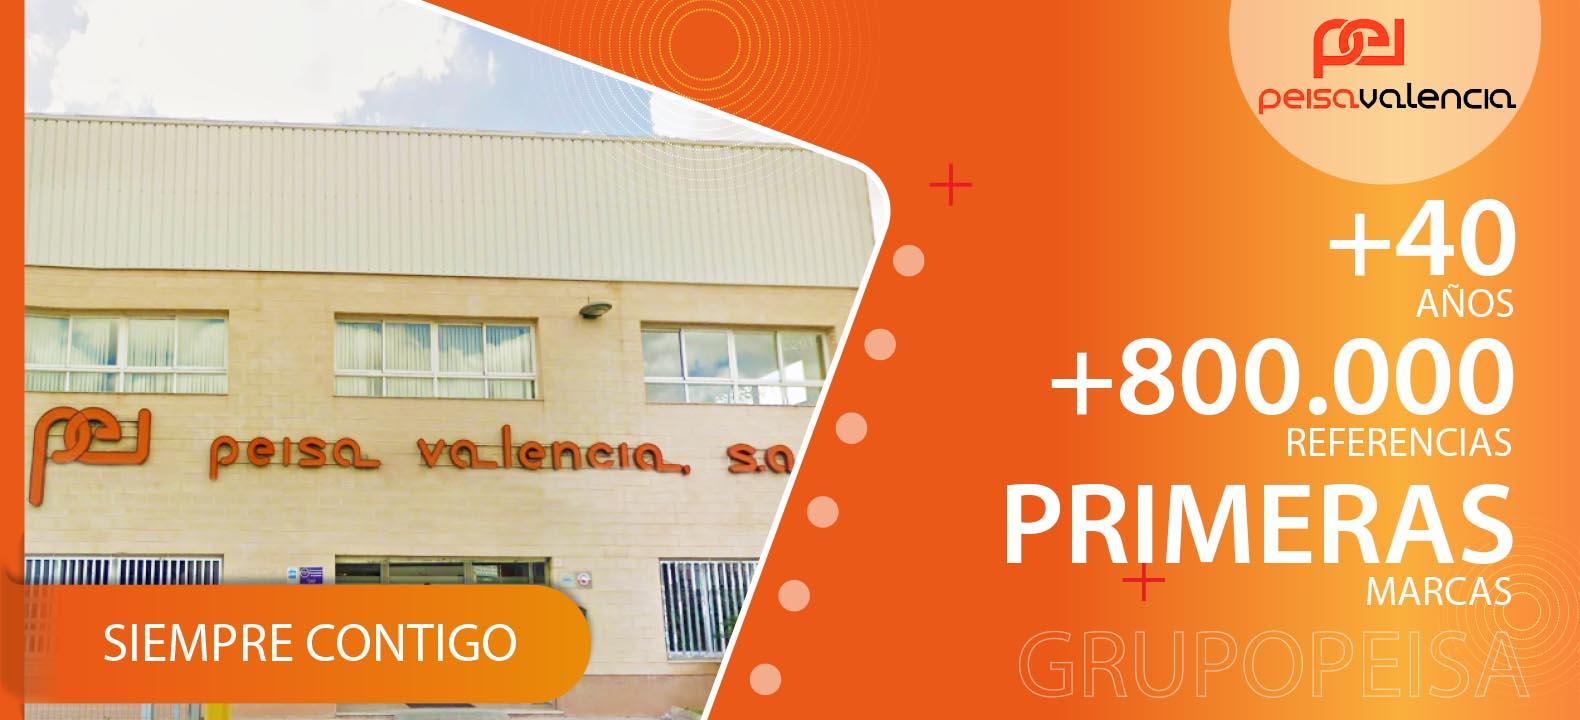 Almacén Distribuidor de Material Eléctrico Valencia